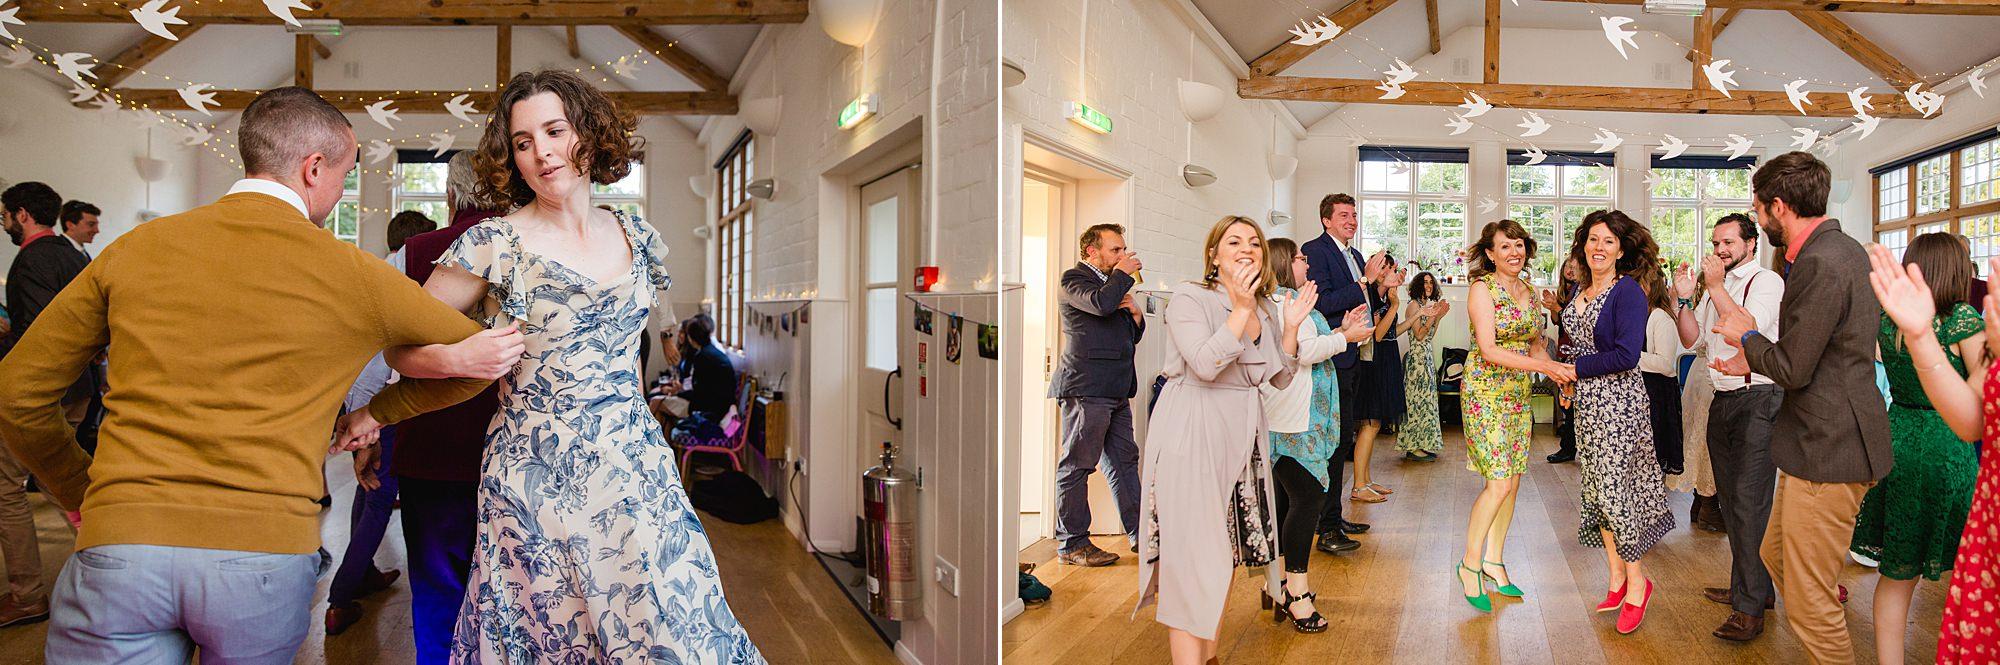 Fun village hall wedding guests dancing a ceiling